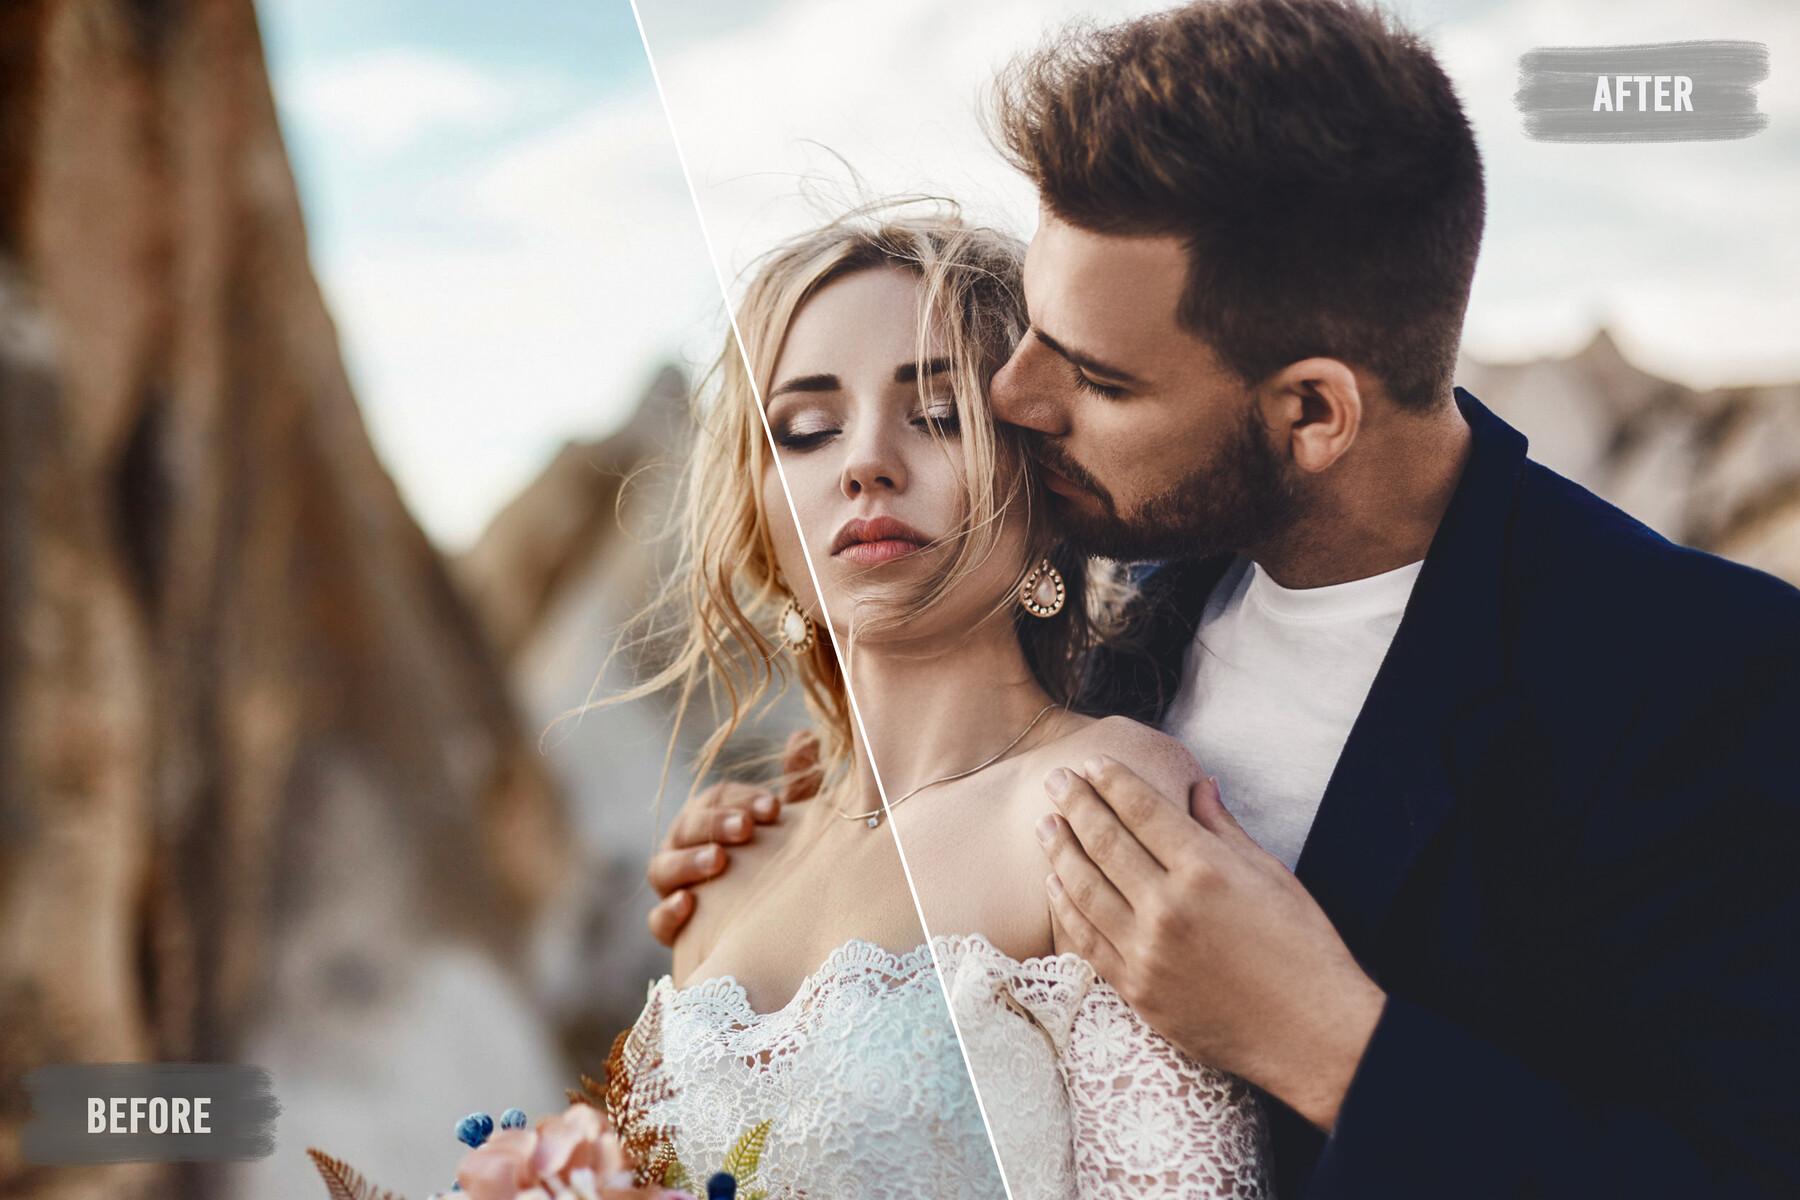 50 Warm Wedding LUTs Pack